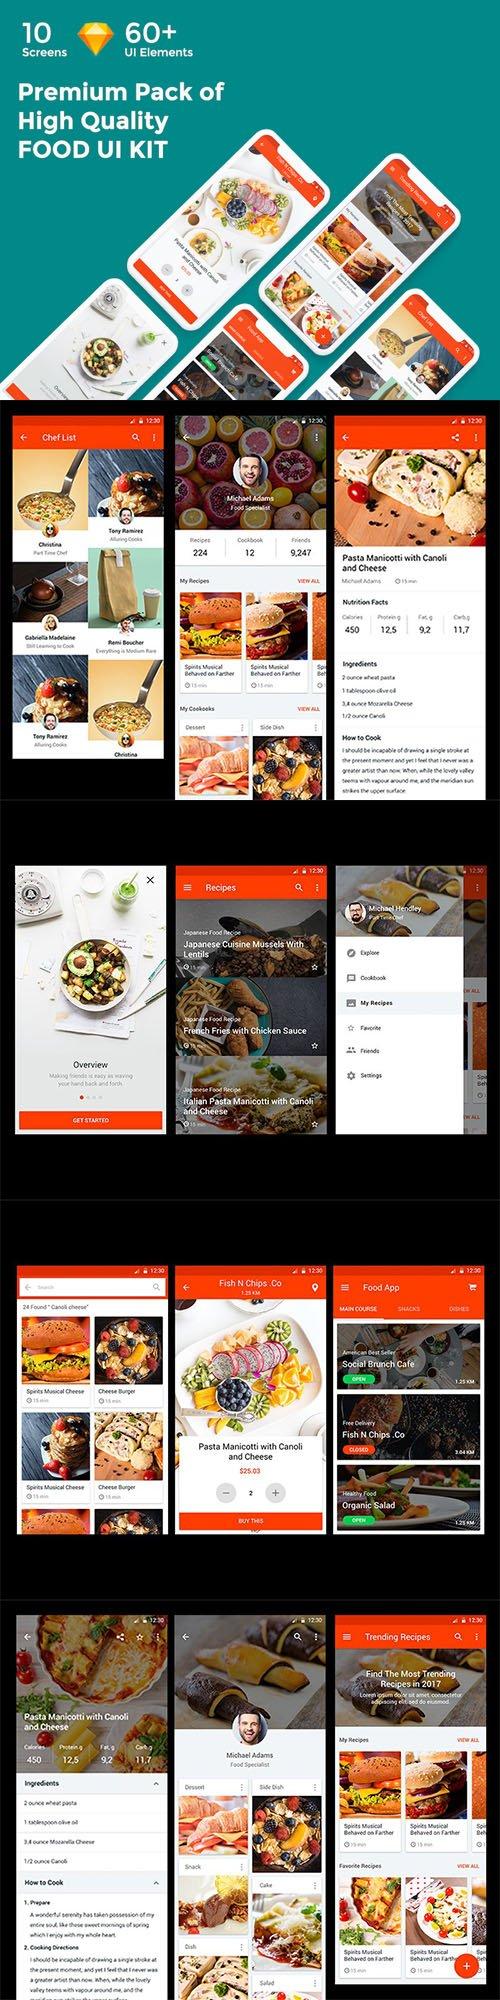 High Quality Food UI Kit